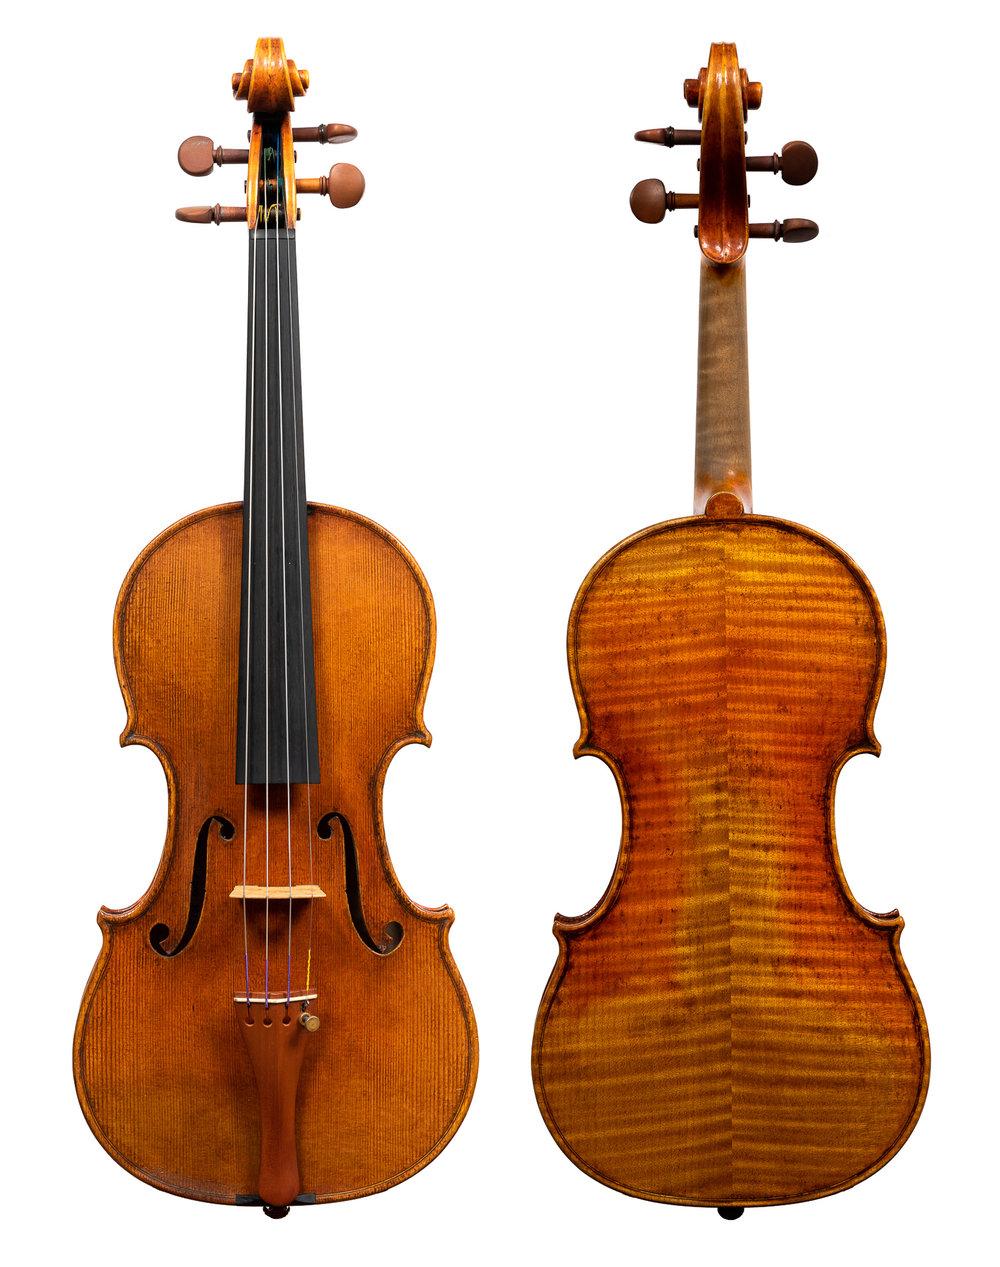 Matsuda Violin